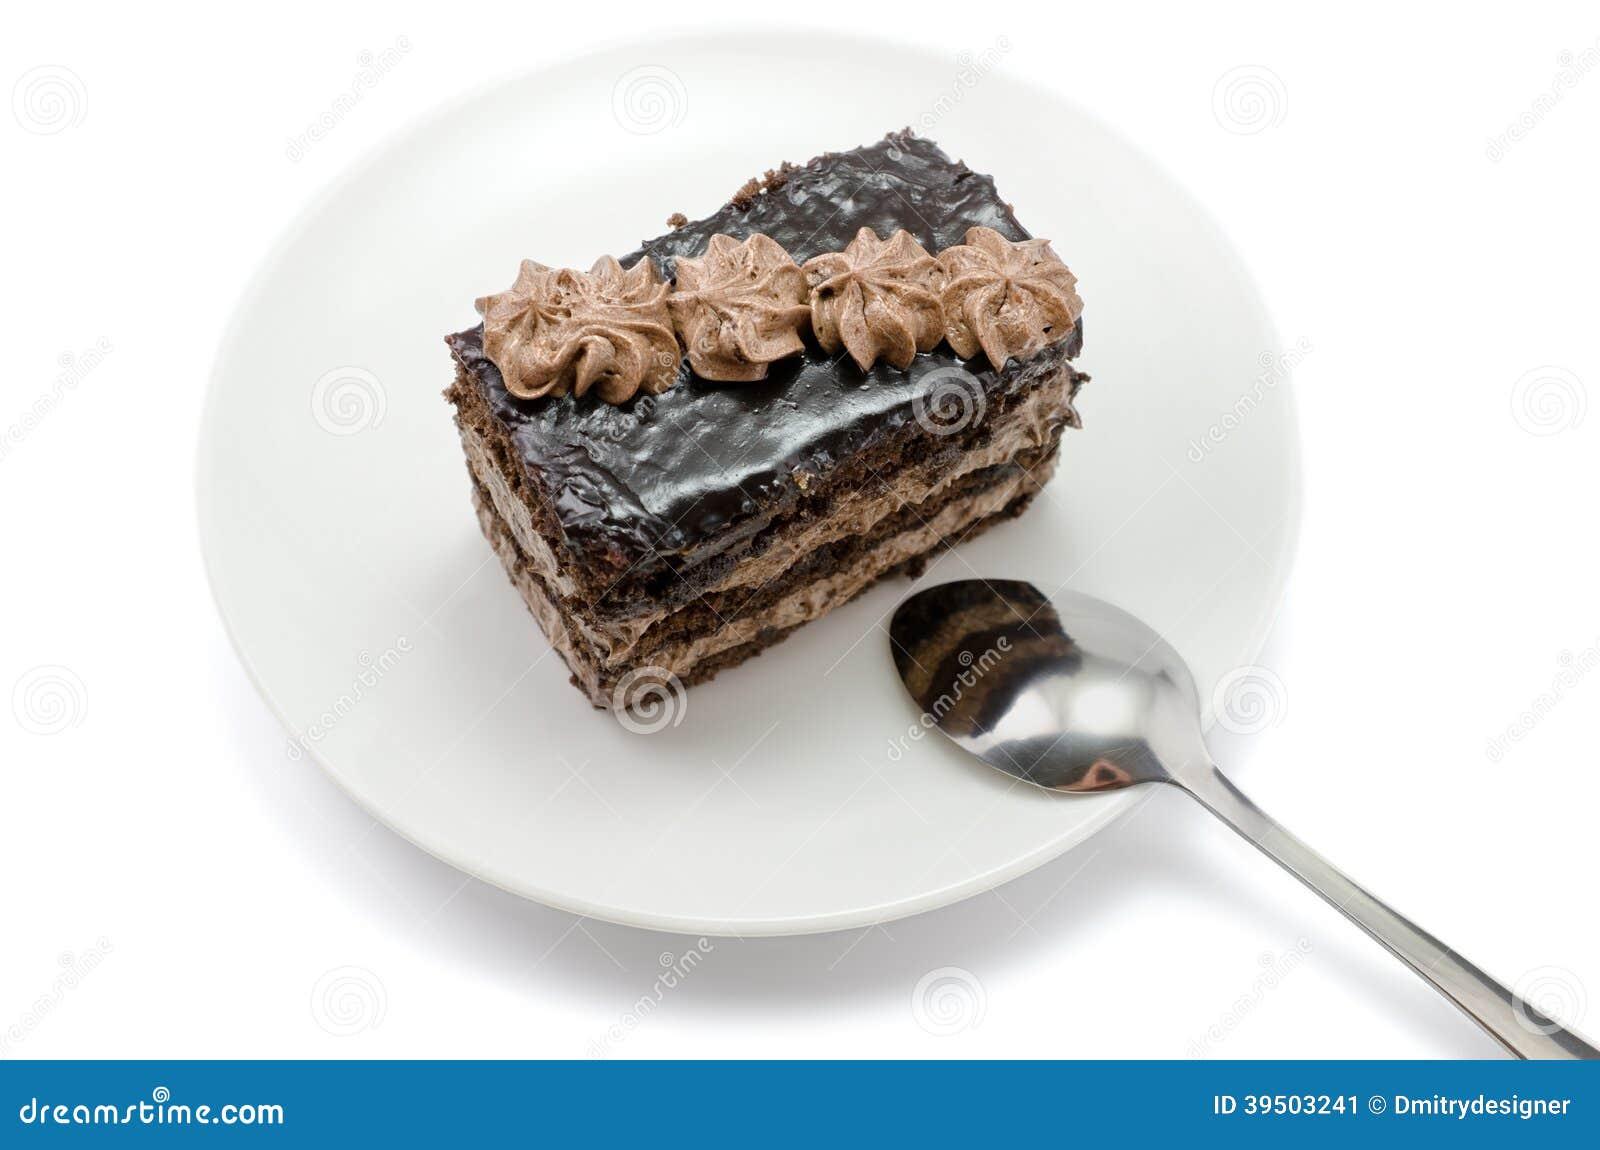 Chocolate cake close-up